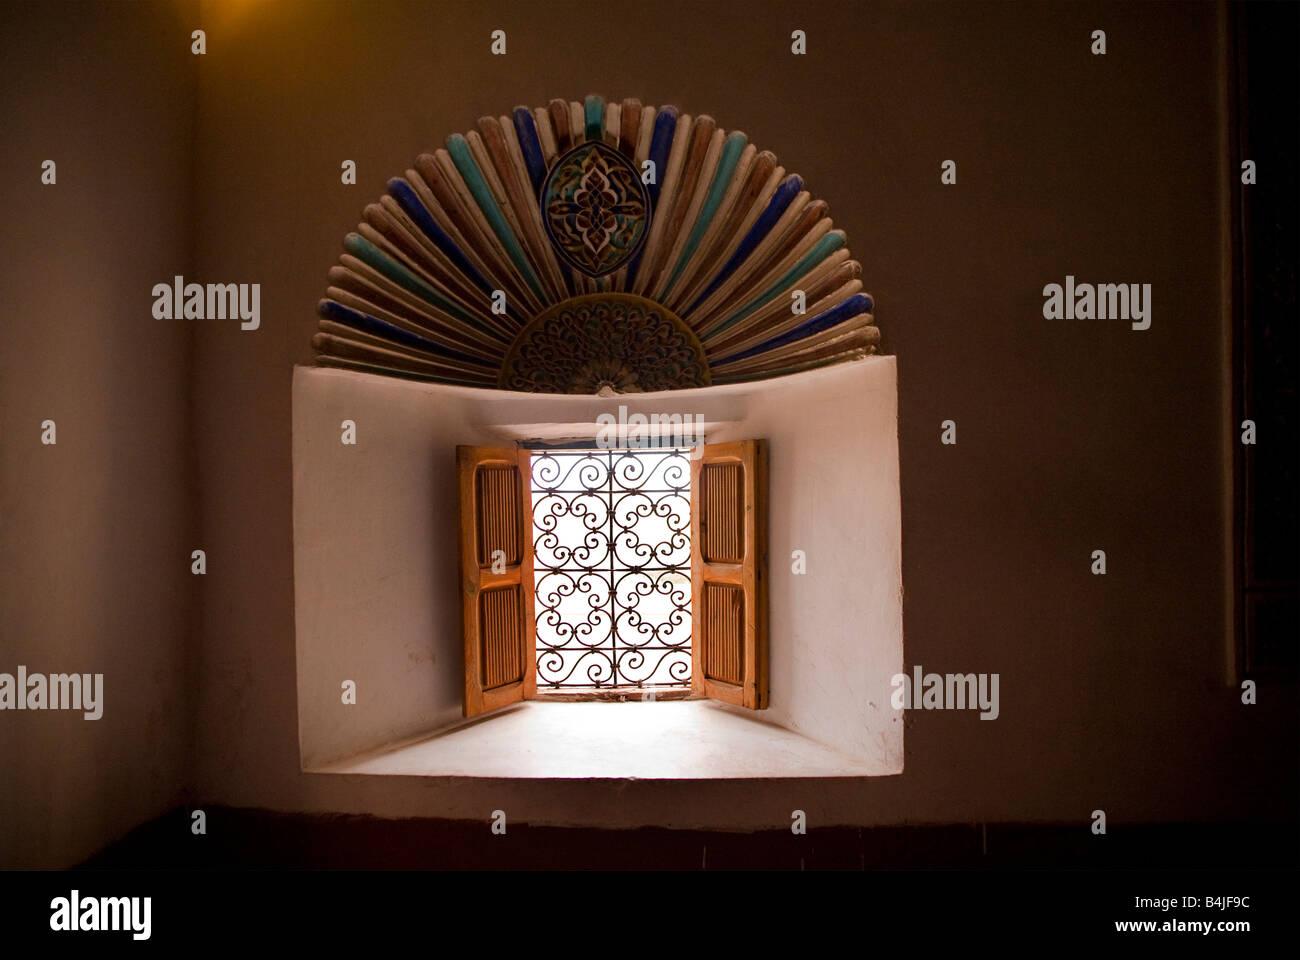 Moroccan Window Stockfotos & Moroccan Window Bilder - Alamy